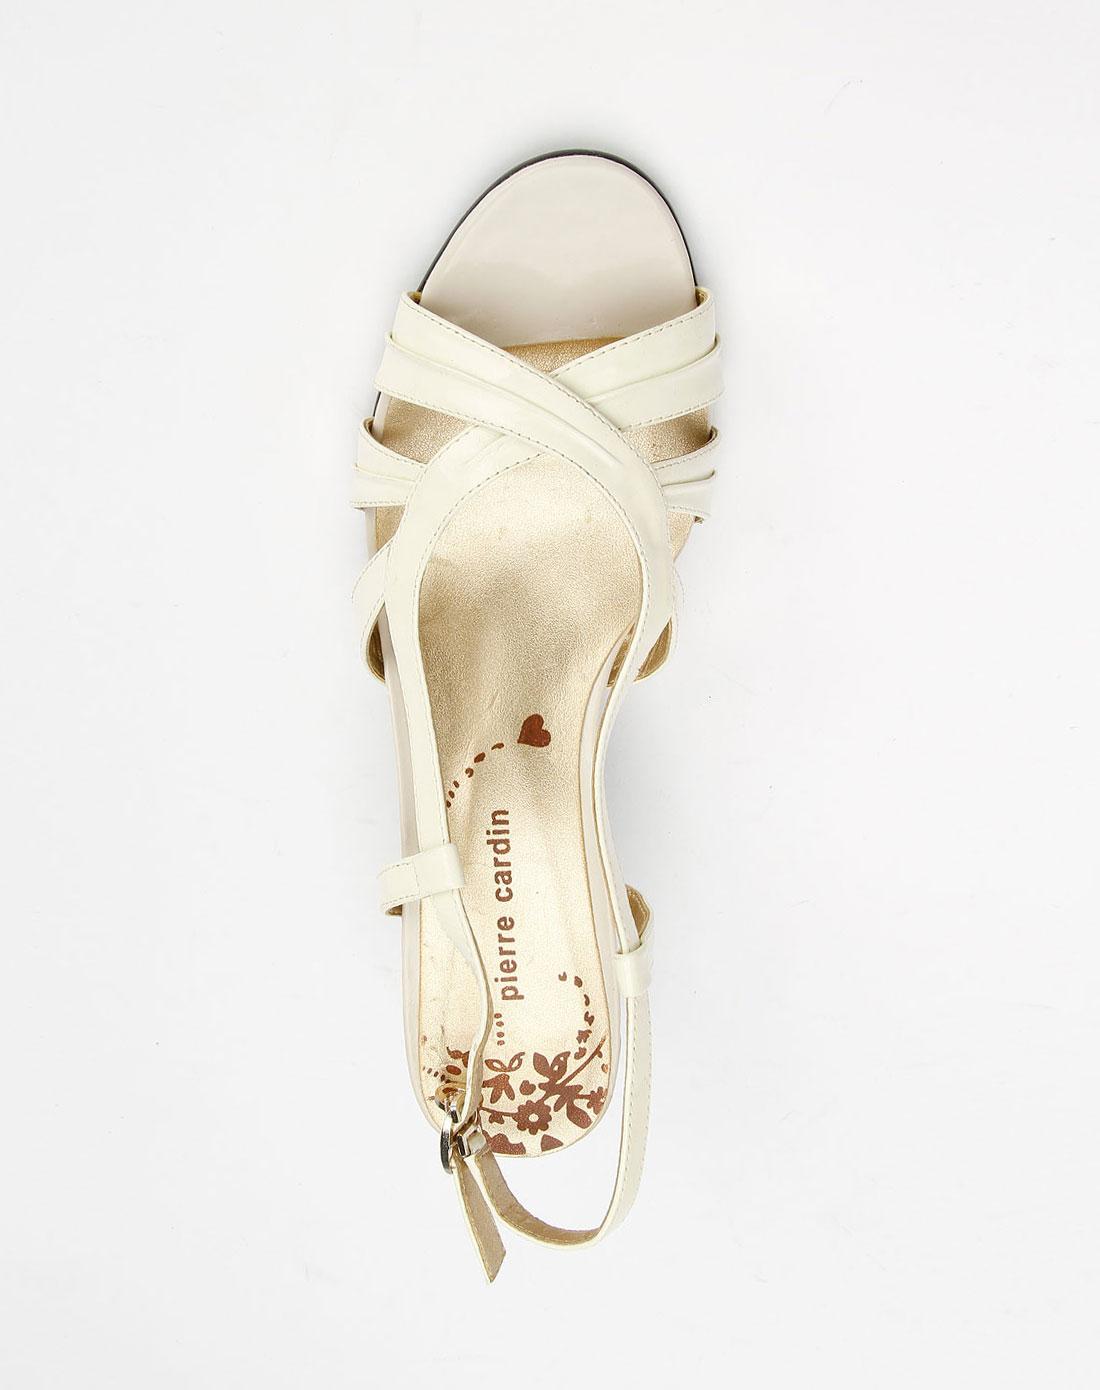 cardin-女鞋专场米白色时尚凉鞋